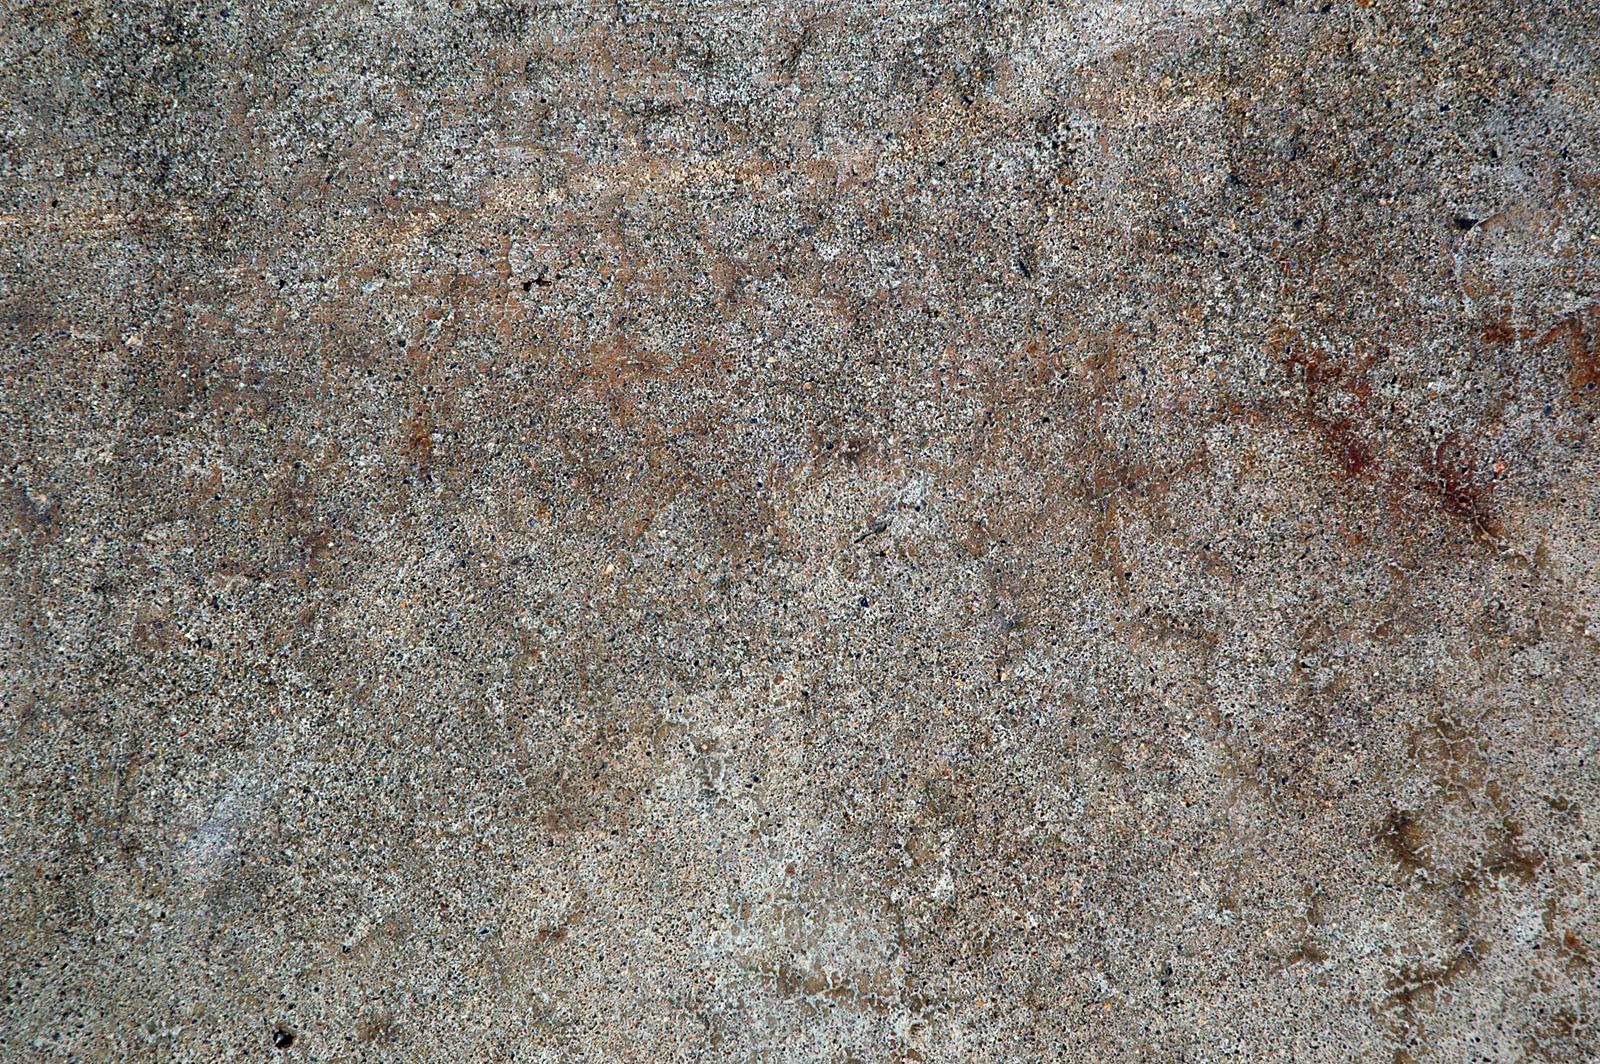 Free DSC 7652 Textures From TextureKing